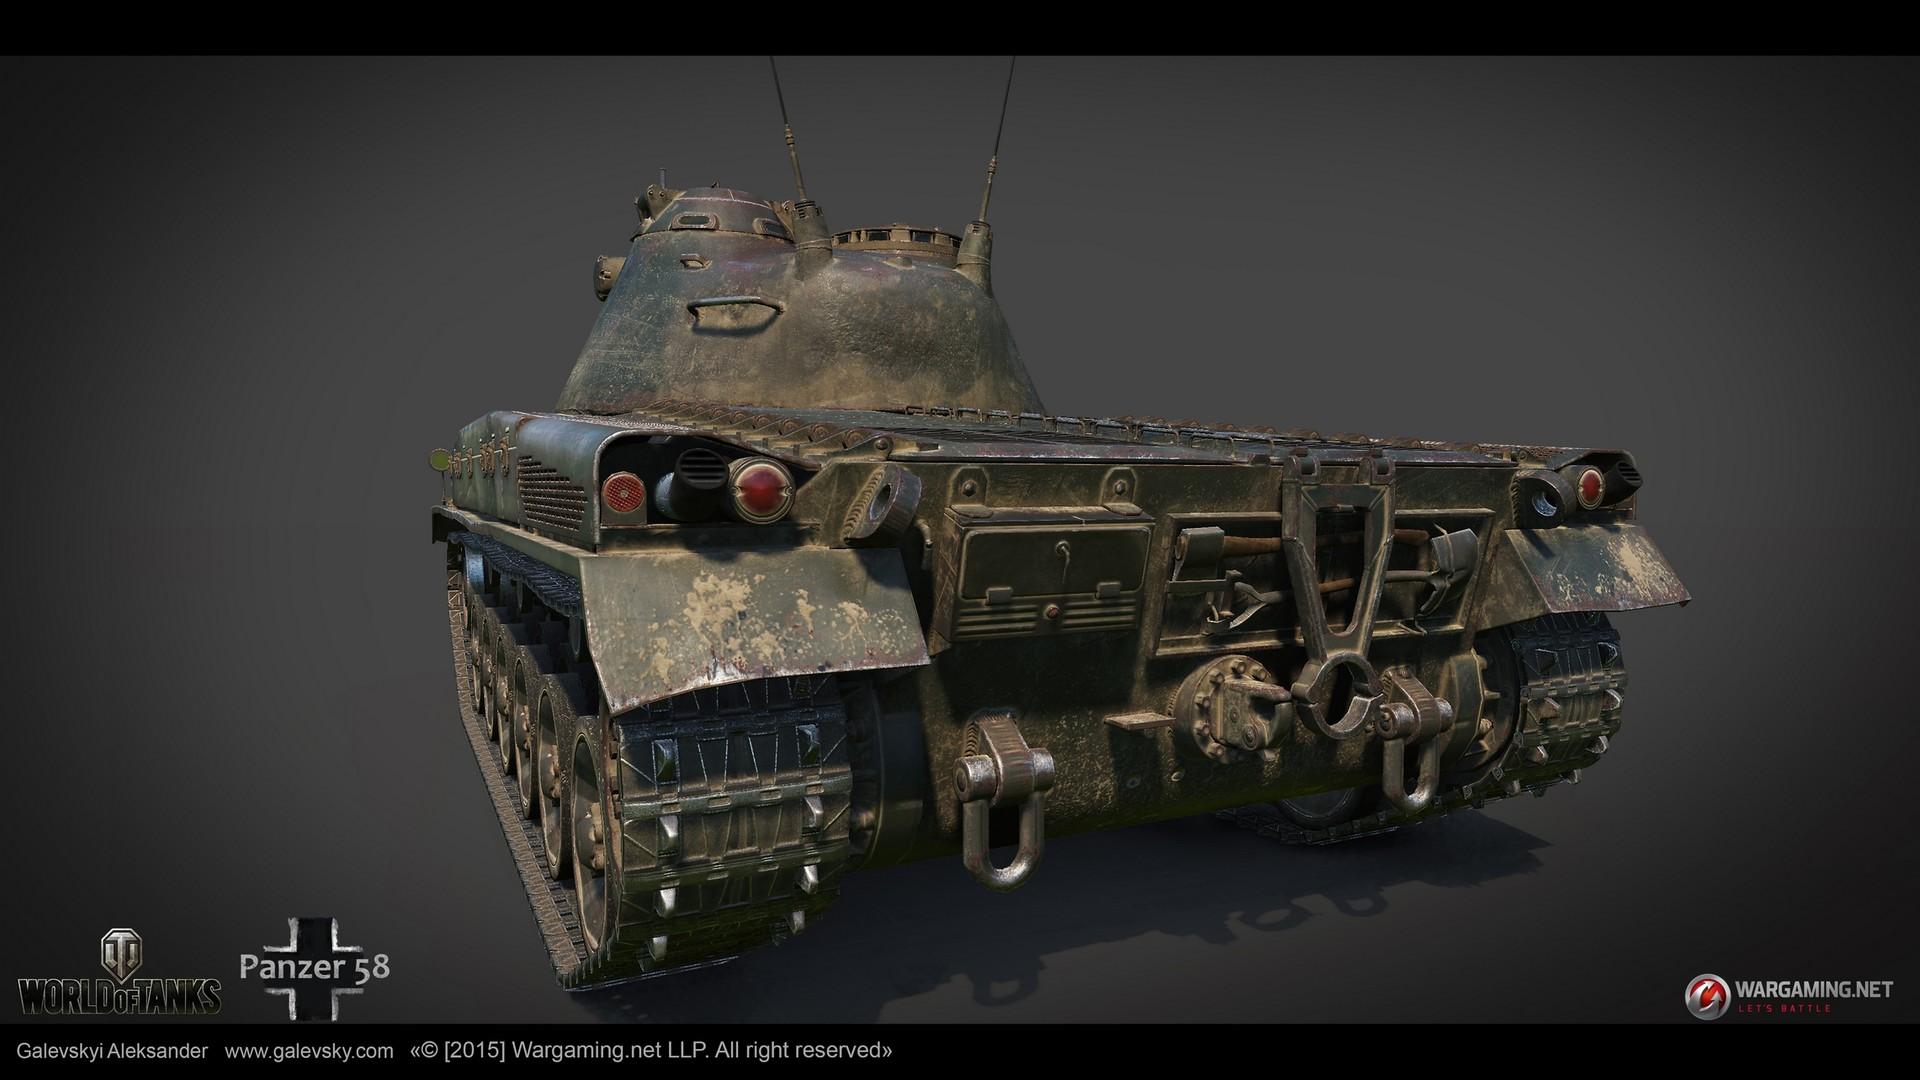 Aleksander galevskyi panzer 58 06 med